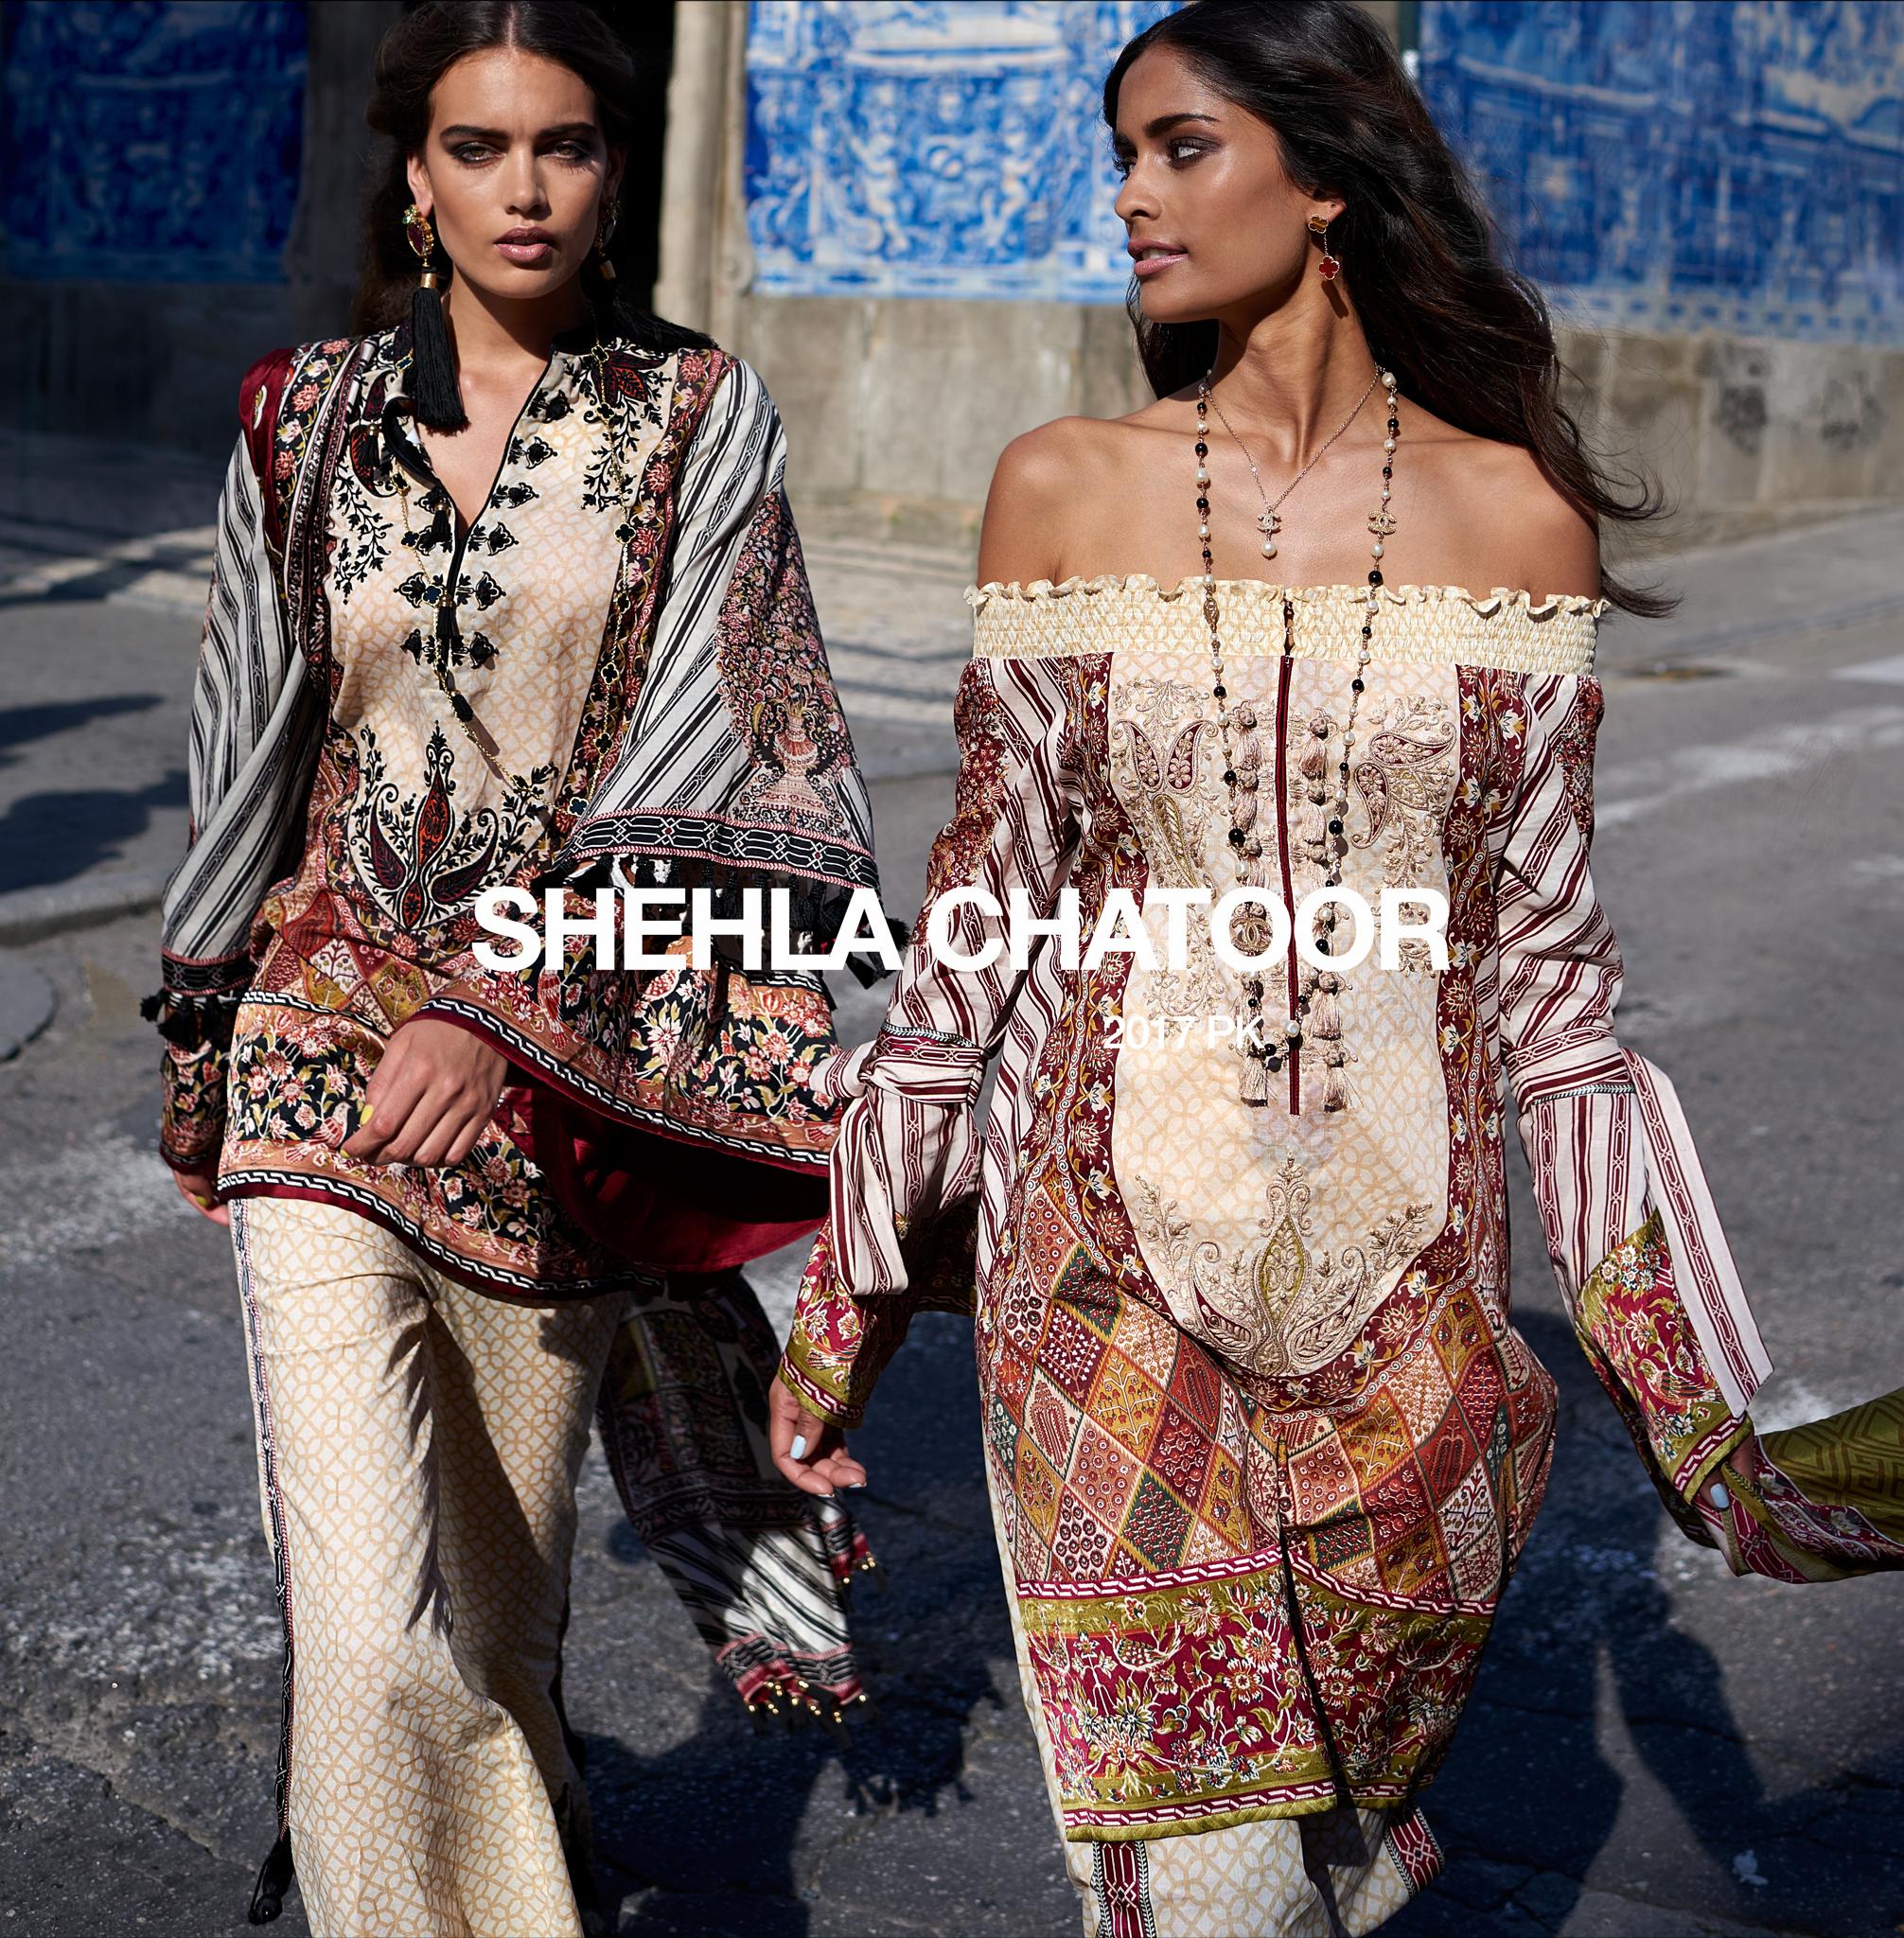 marioprincipe_shehla chatoor0071.jpg